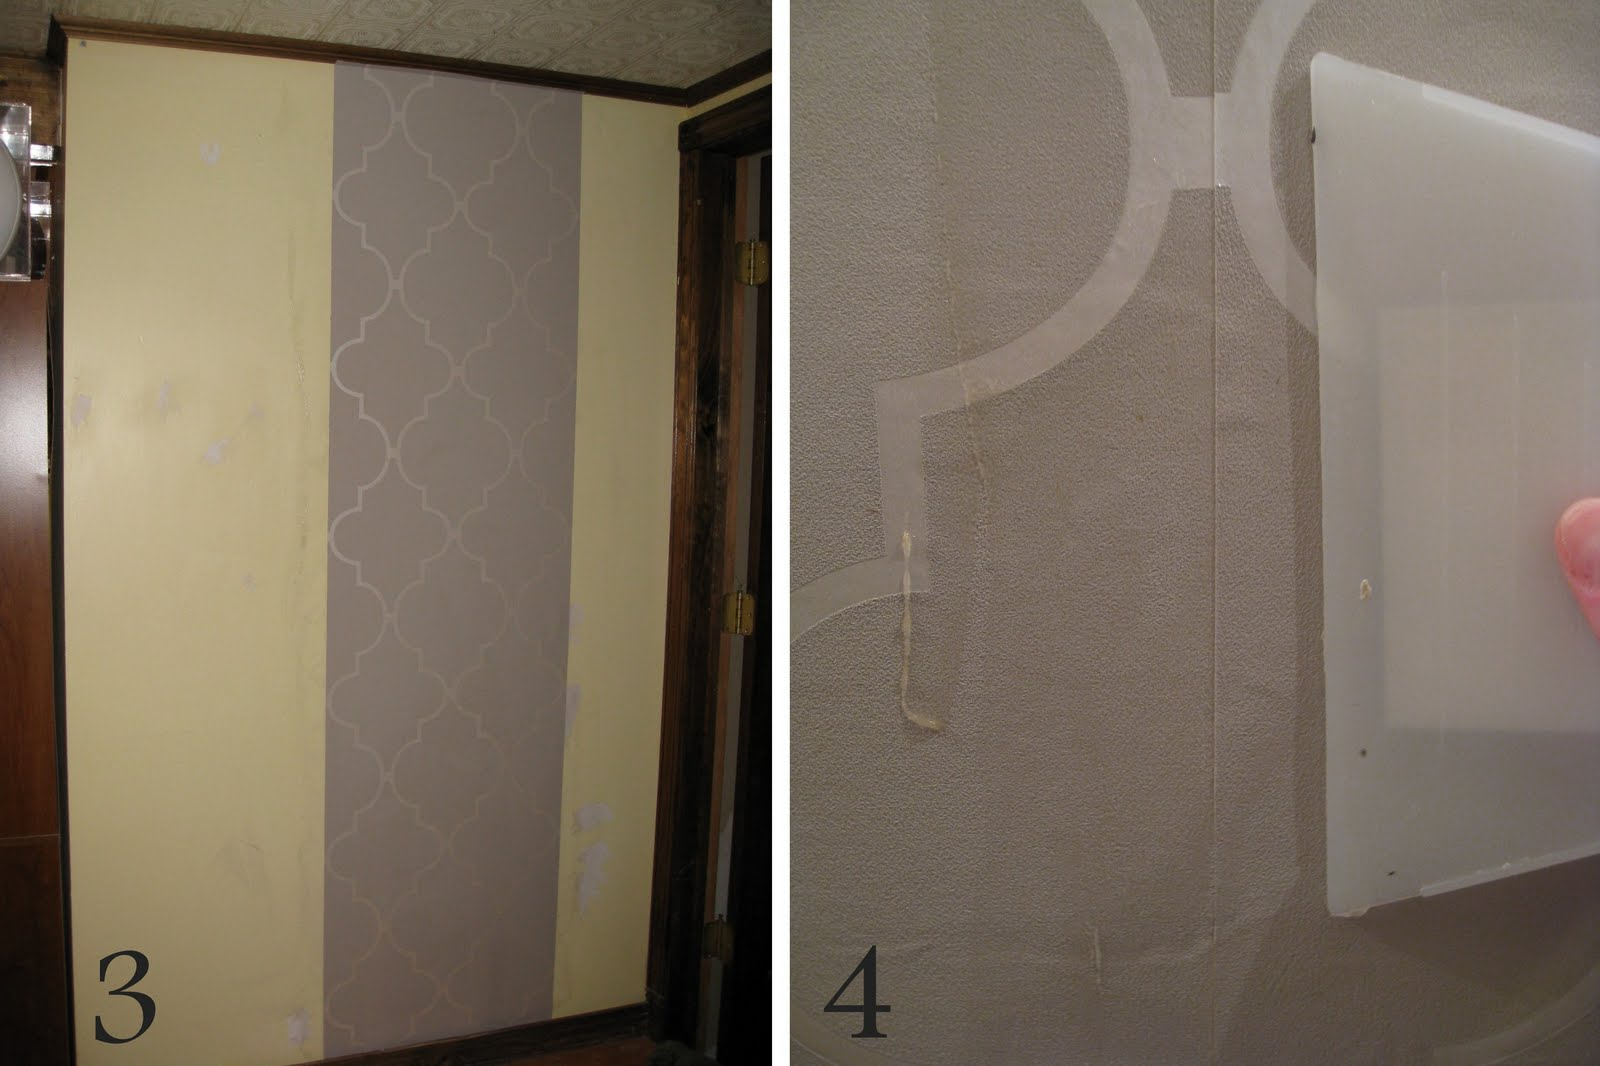 http://3.bp.blogspot.com/-J-RLXsSfpqA/TVUjDYmXguI/AAAAAAAAIPg/GxzNKJWg2Is/s1600/DIY_wallpaper-2.jpg